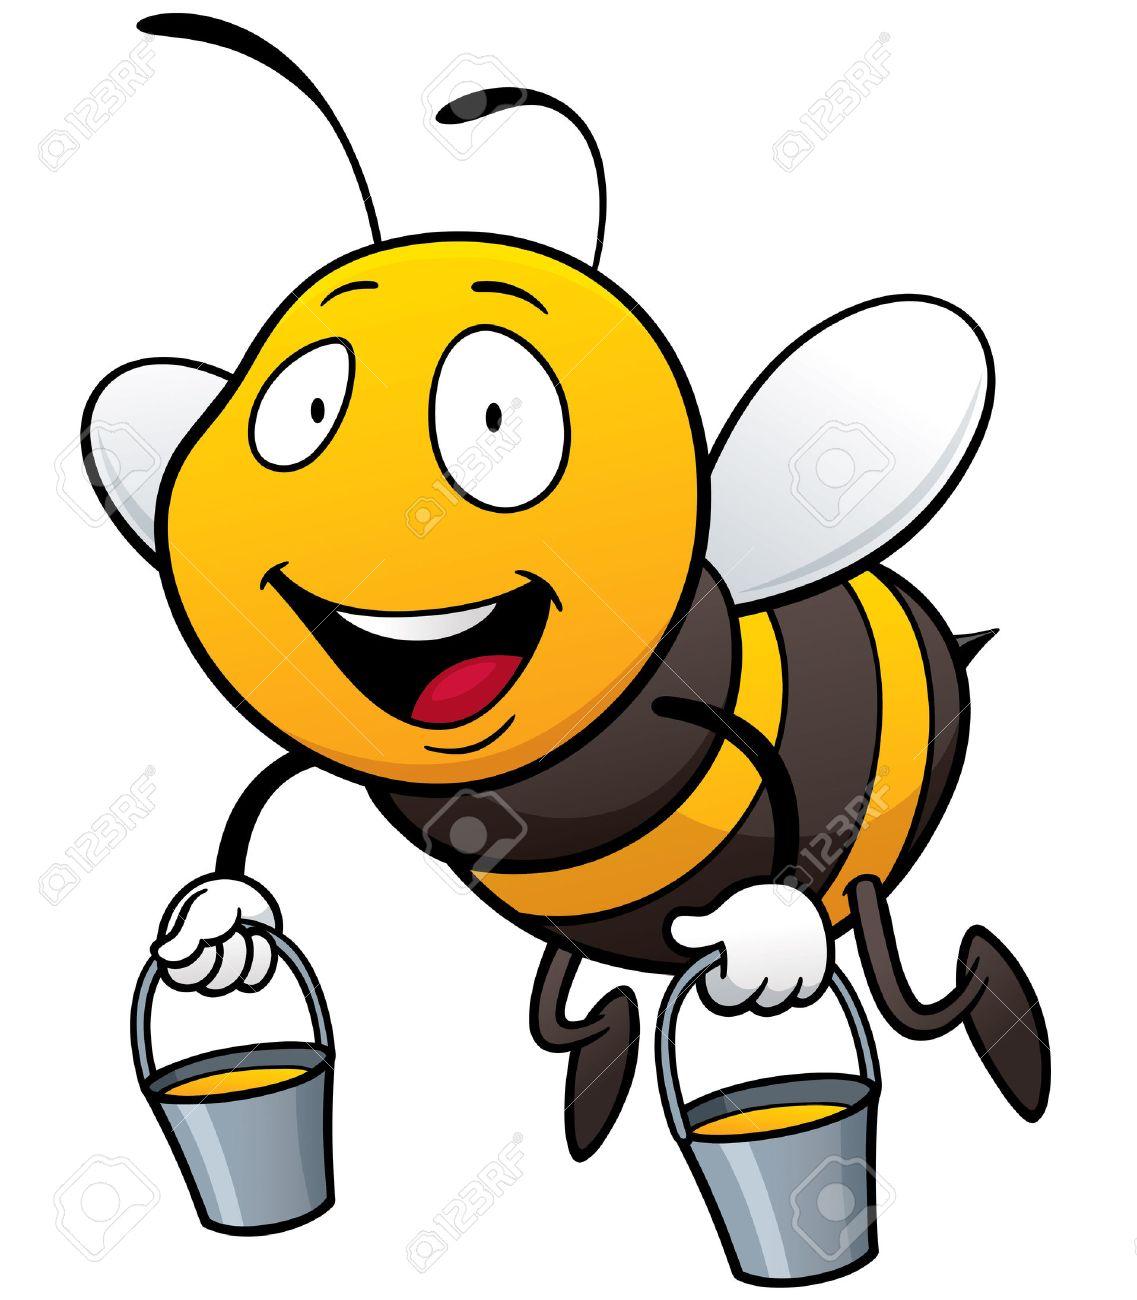 1137x1300 Honey Bee Drawing Cartoon How To Draw A Cartoon Bee